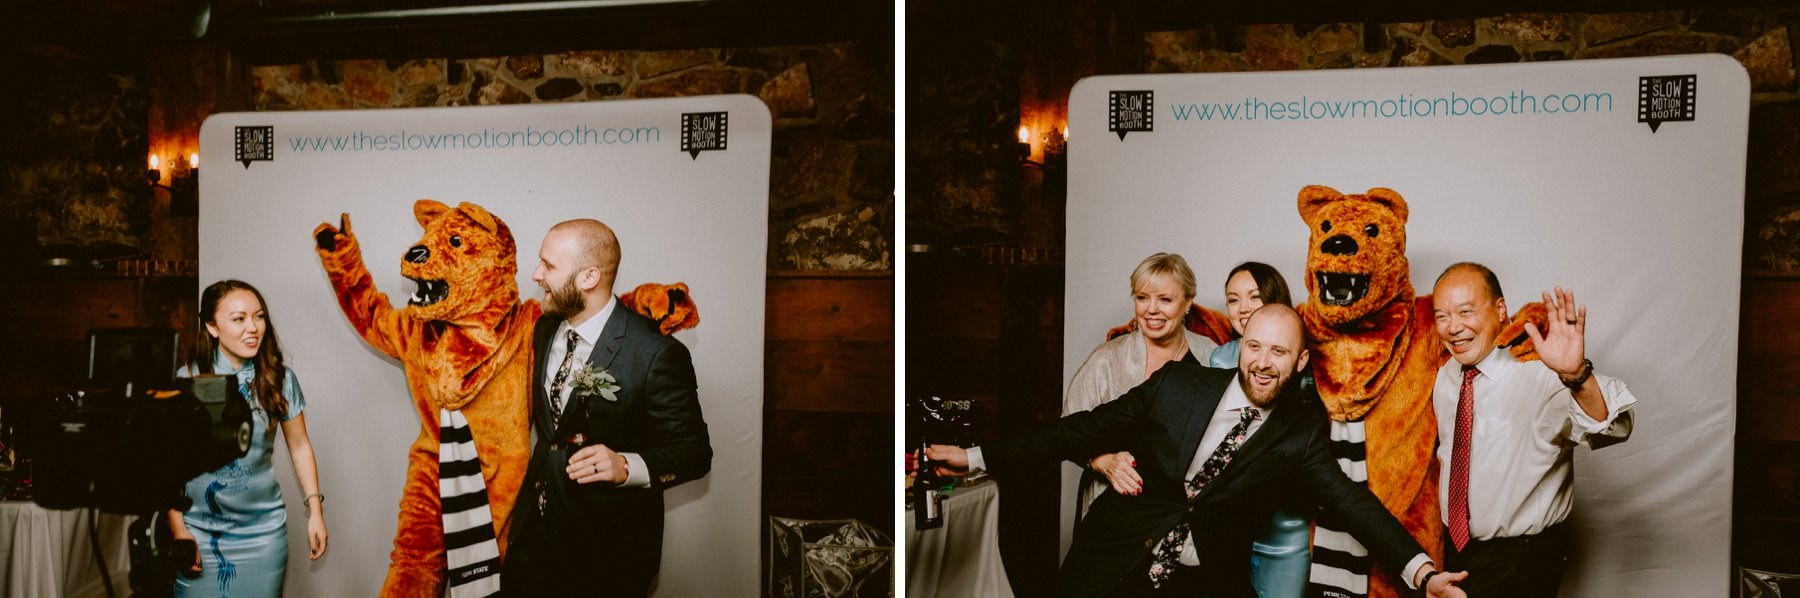 Tyler_arboretum_wedding-094.jpg